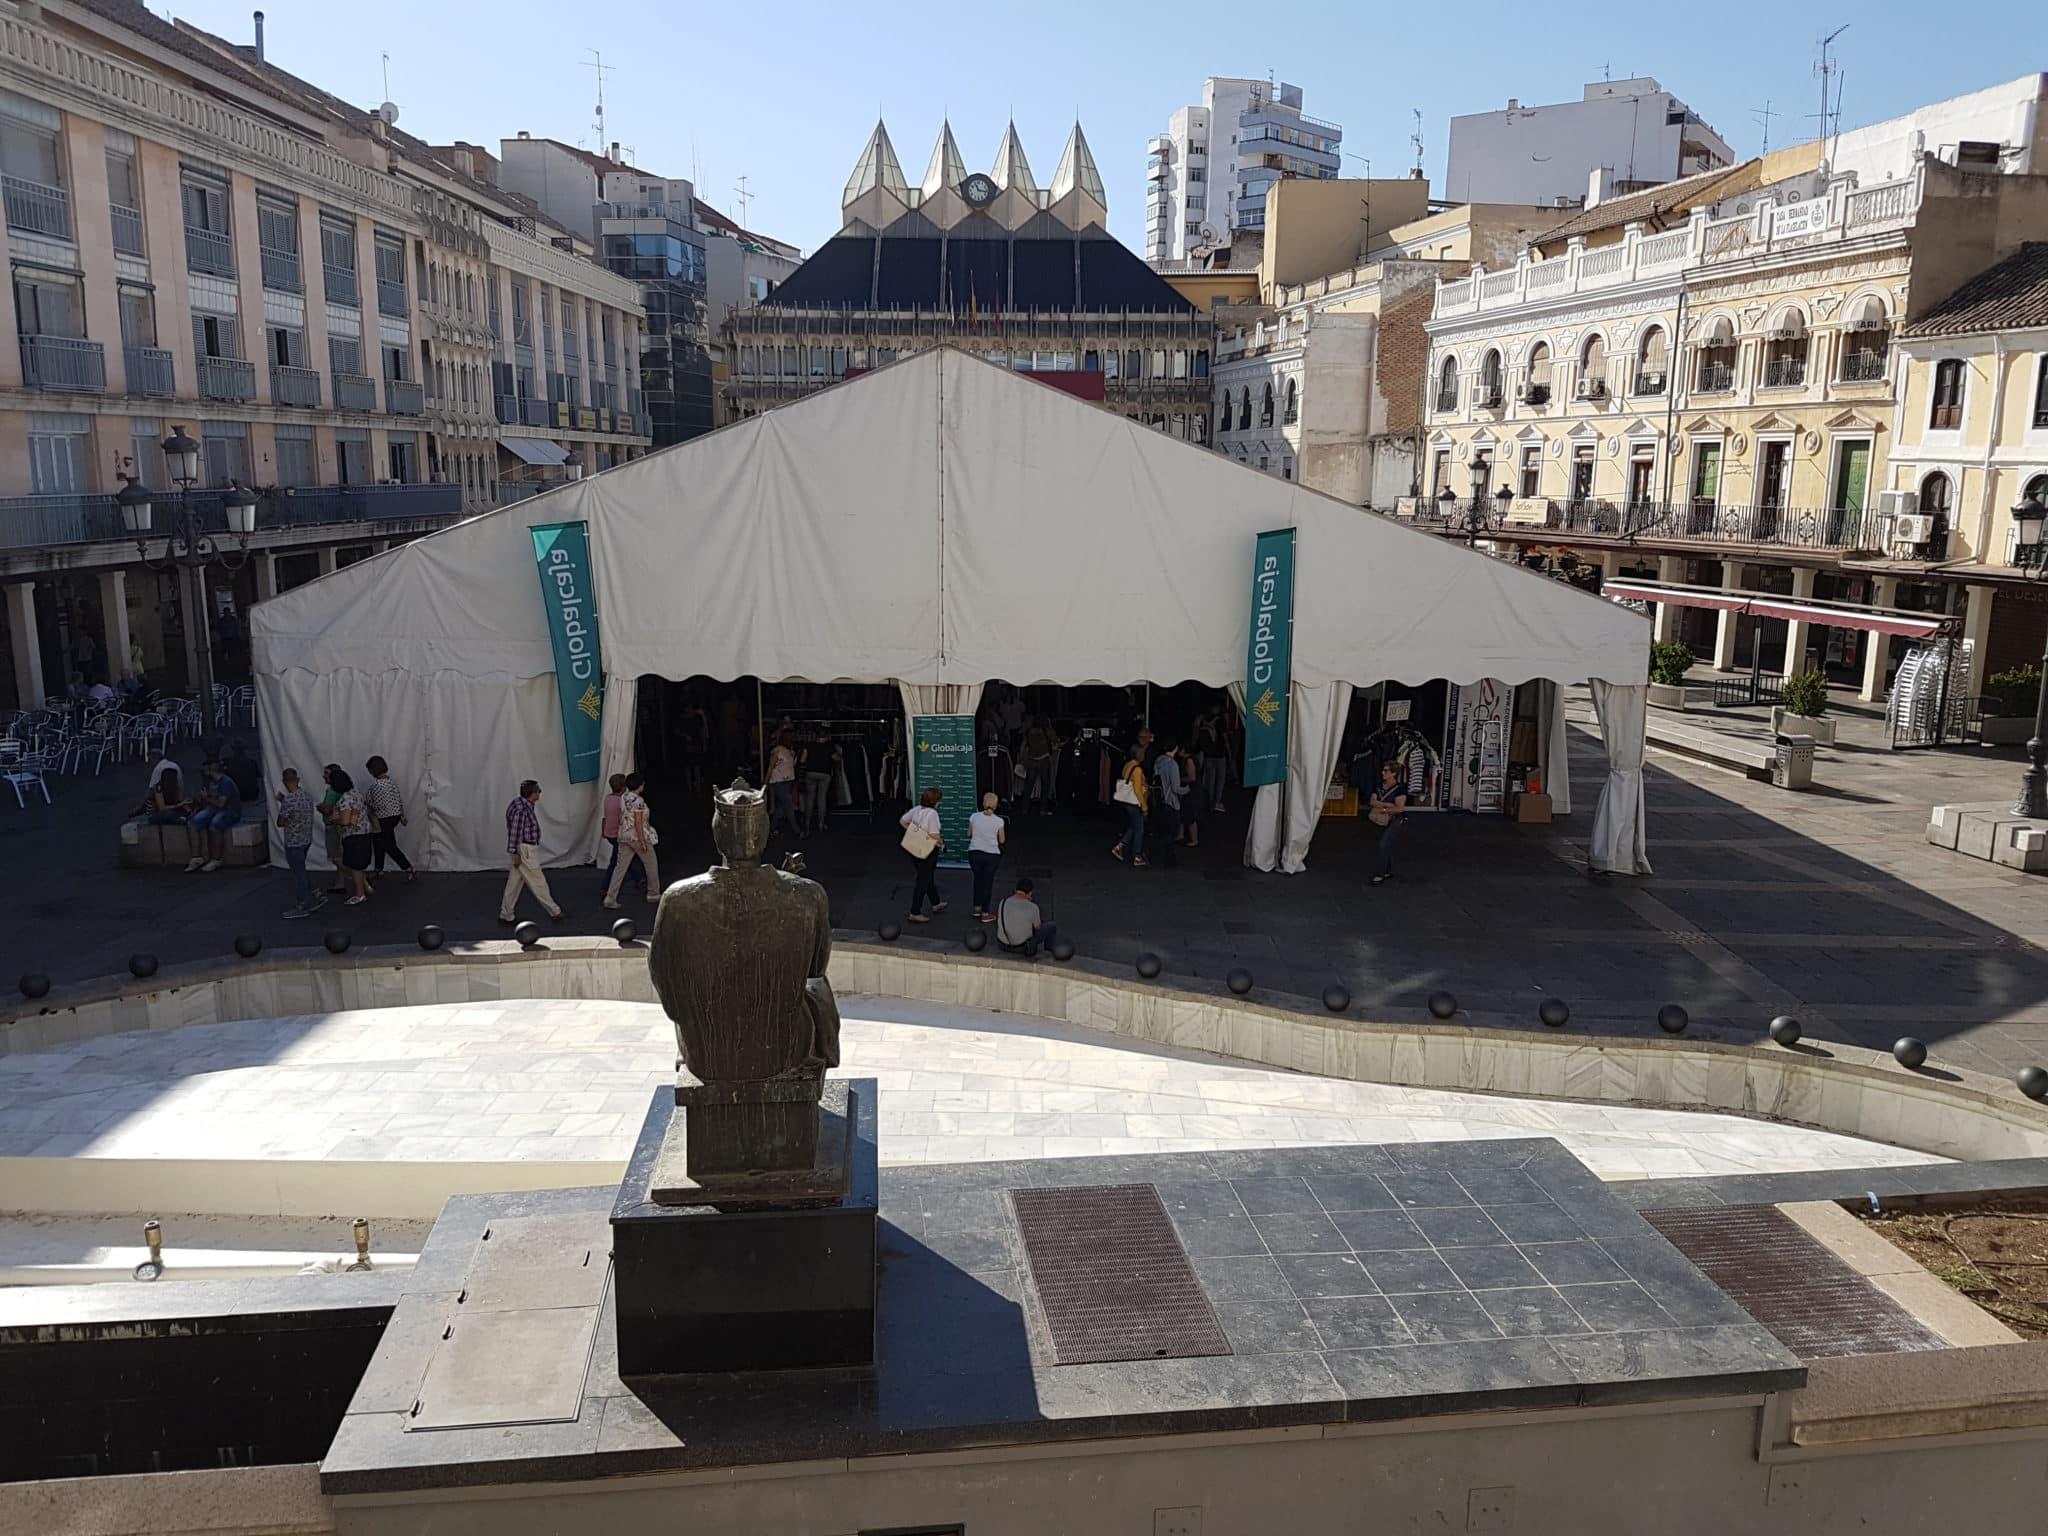 https://blog.globalcaja.es/wp-content/uploads/2017/10/comercio-ciudad-real.jpg